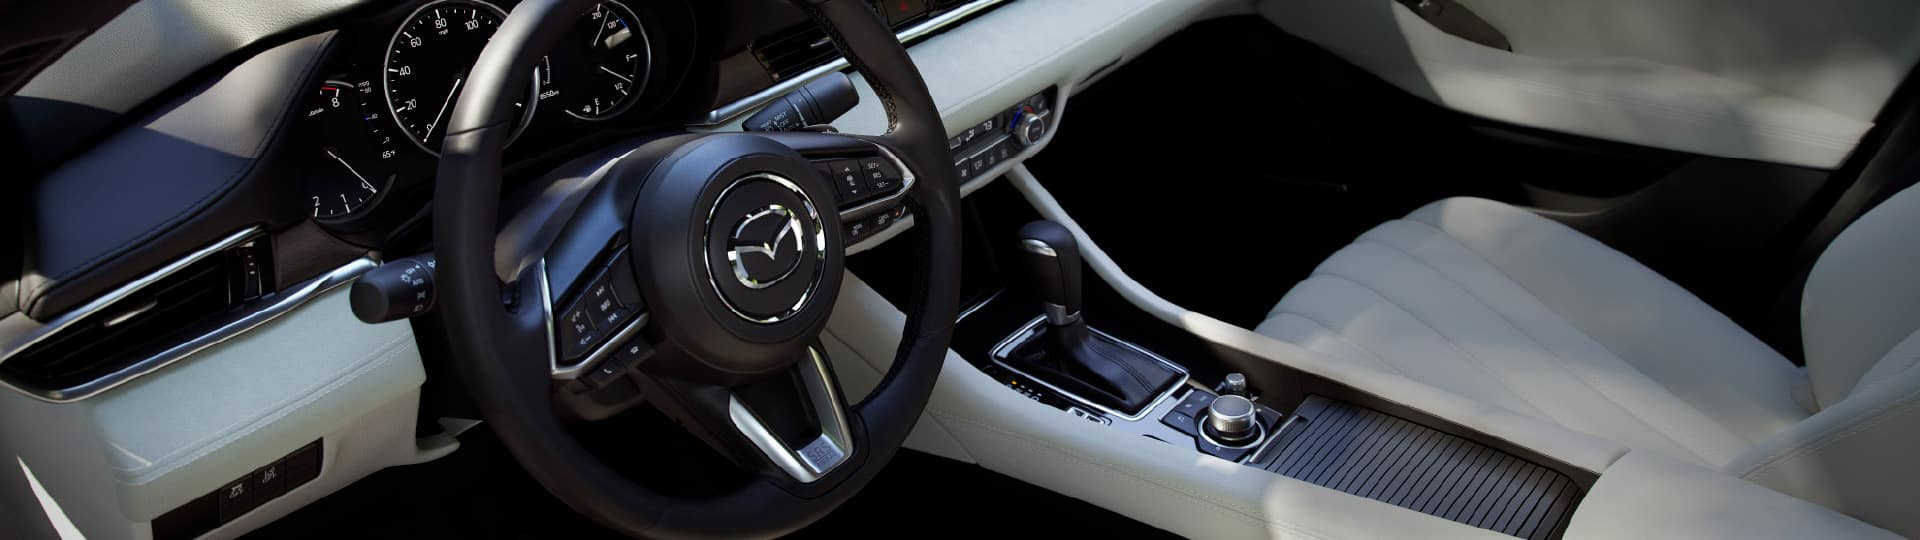 2018 Mazda6 front interior